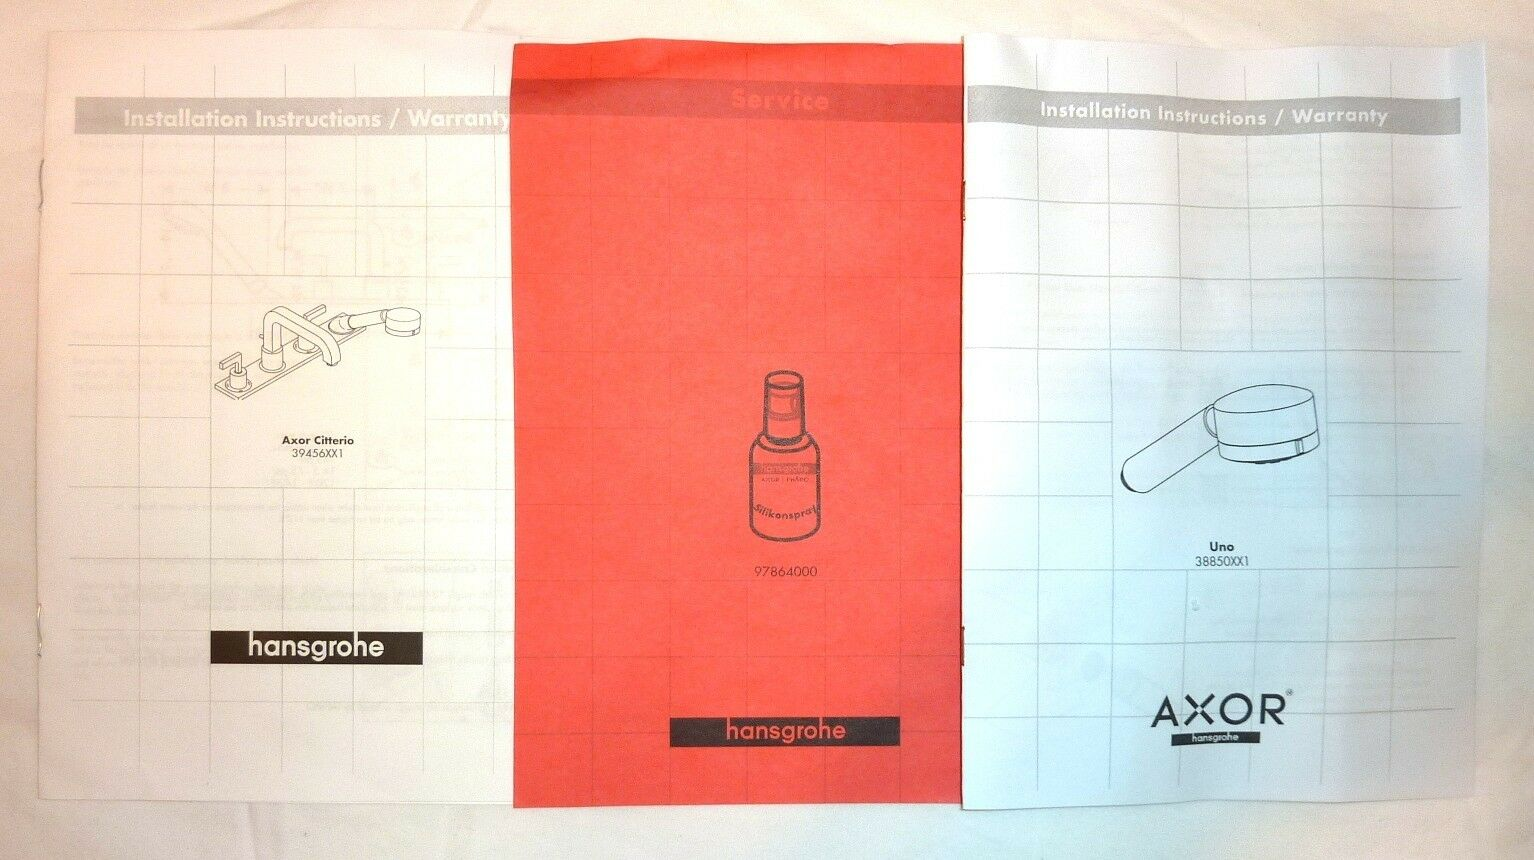 Funky Buy Hansgrohe Embellishment - Luxurious Bathtub Ideas and ...